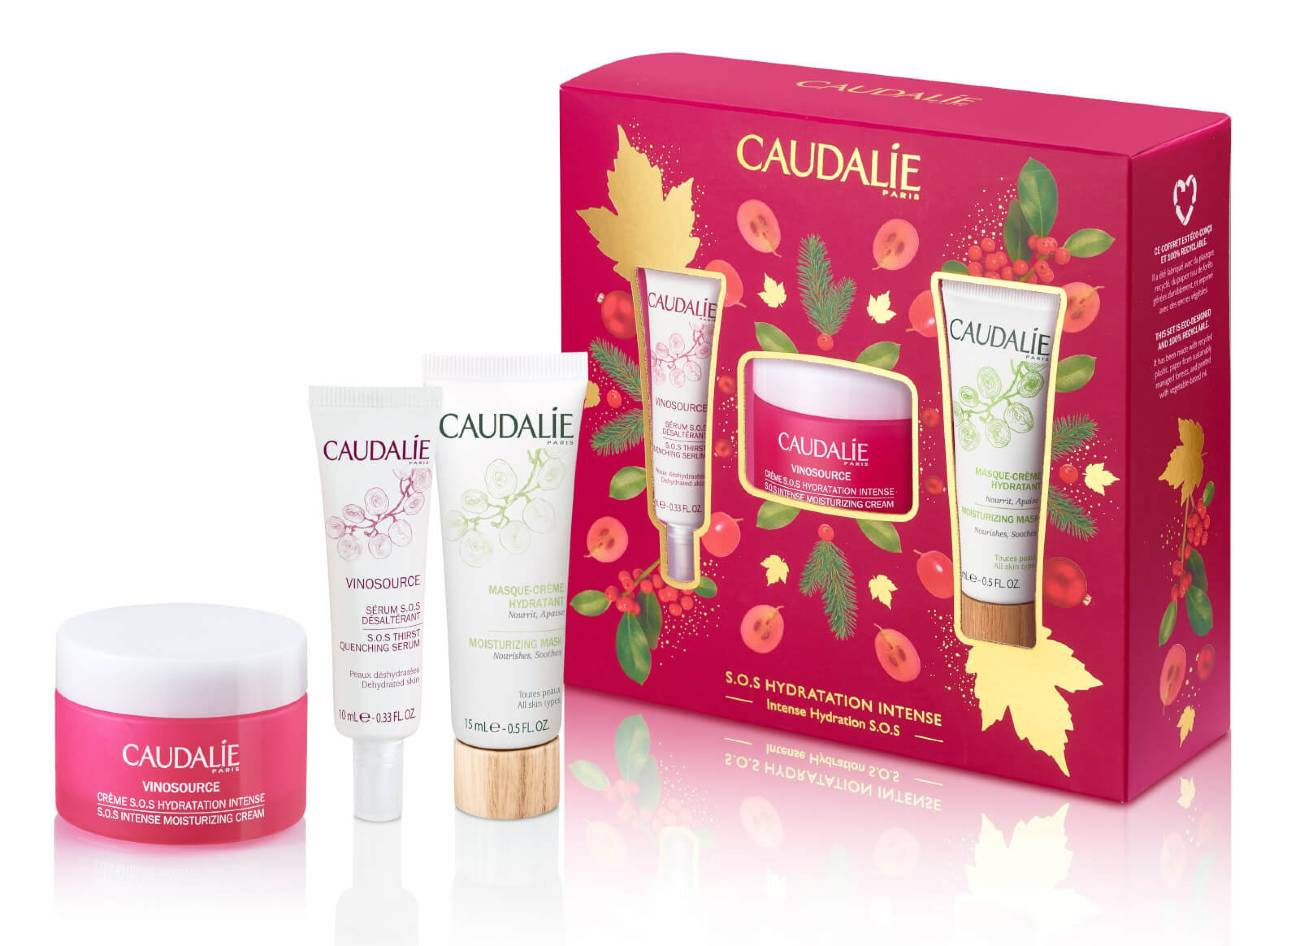 Caudalie Vinosource SOS Cream Christmas Set Intense Hydration SOS